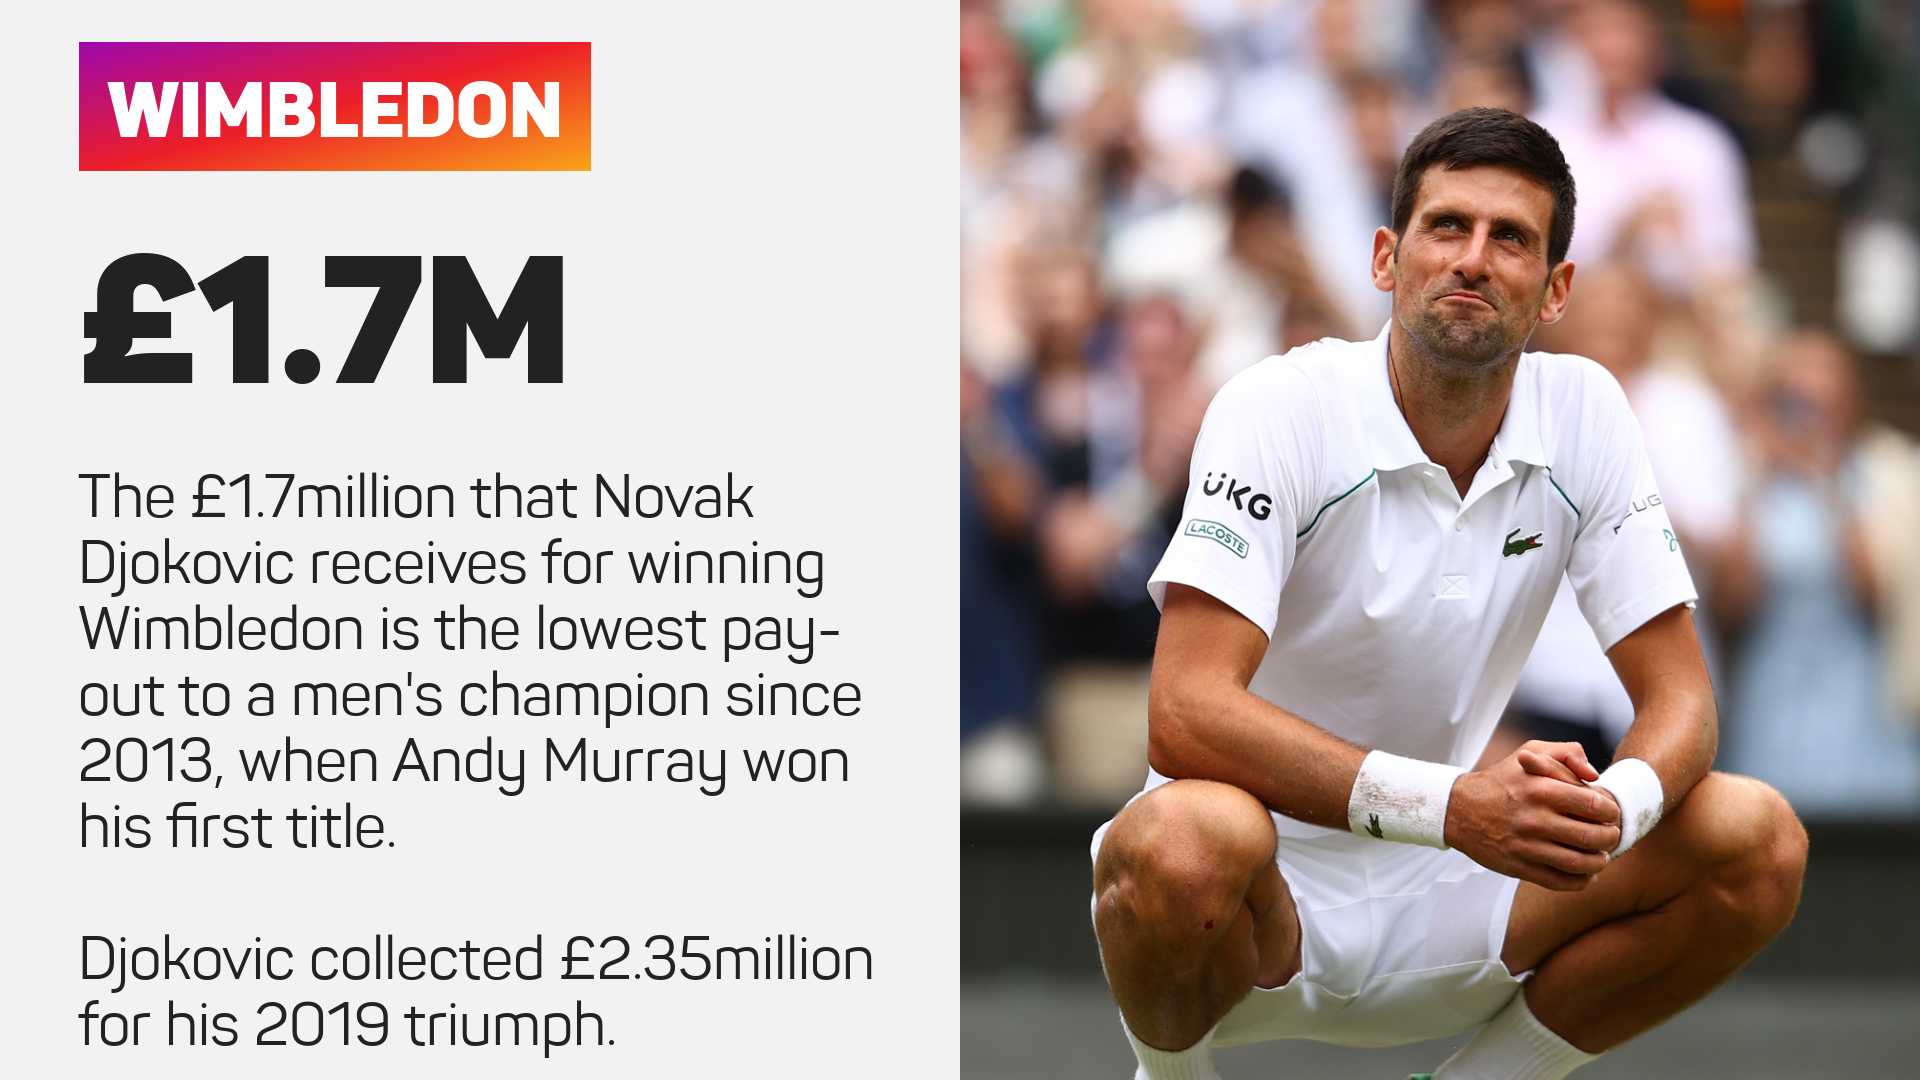 Novak Djokovic prize money